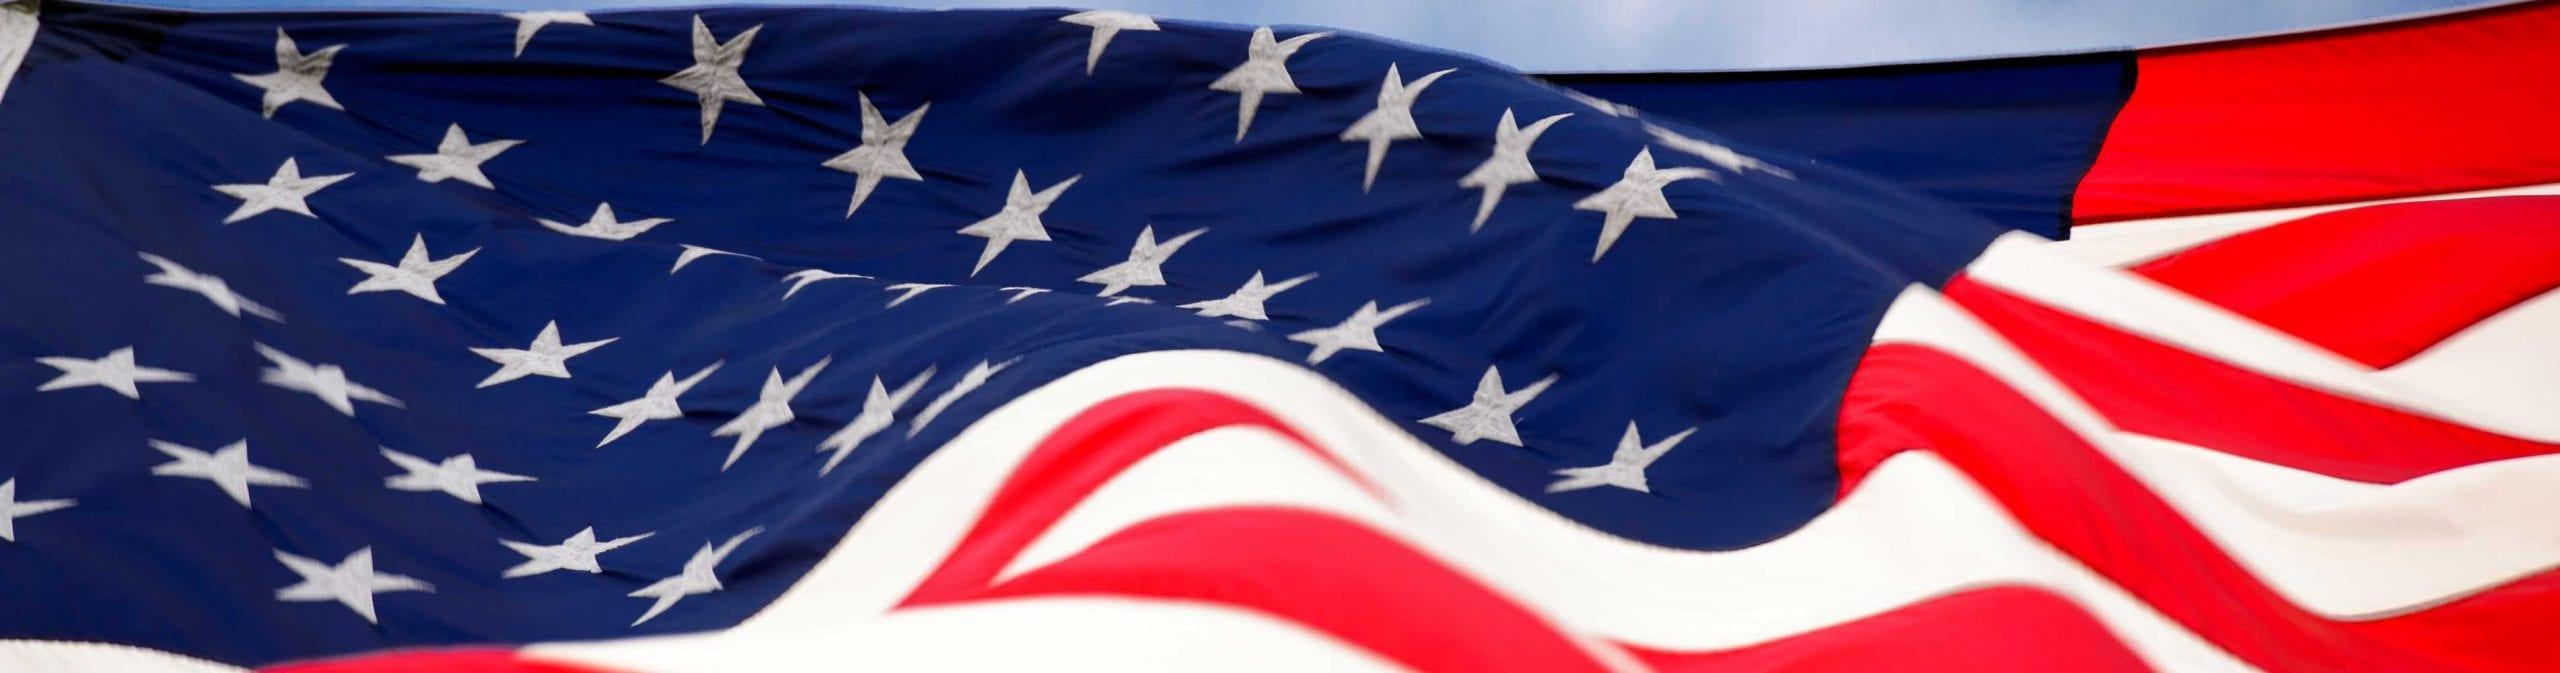 International Focus: Online Gambling Updates from the U.S. 2020